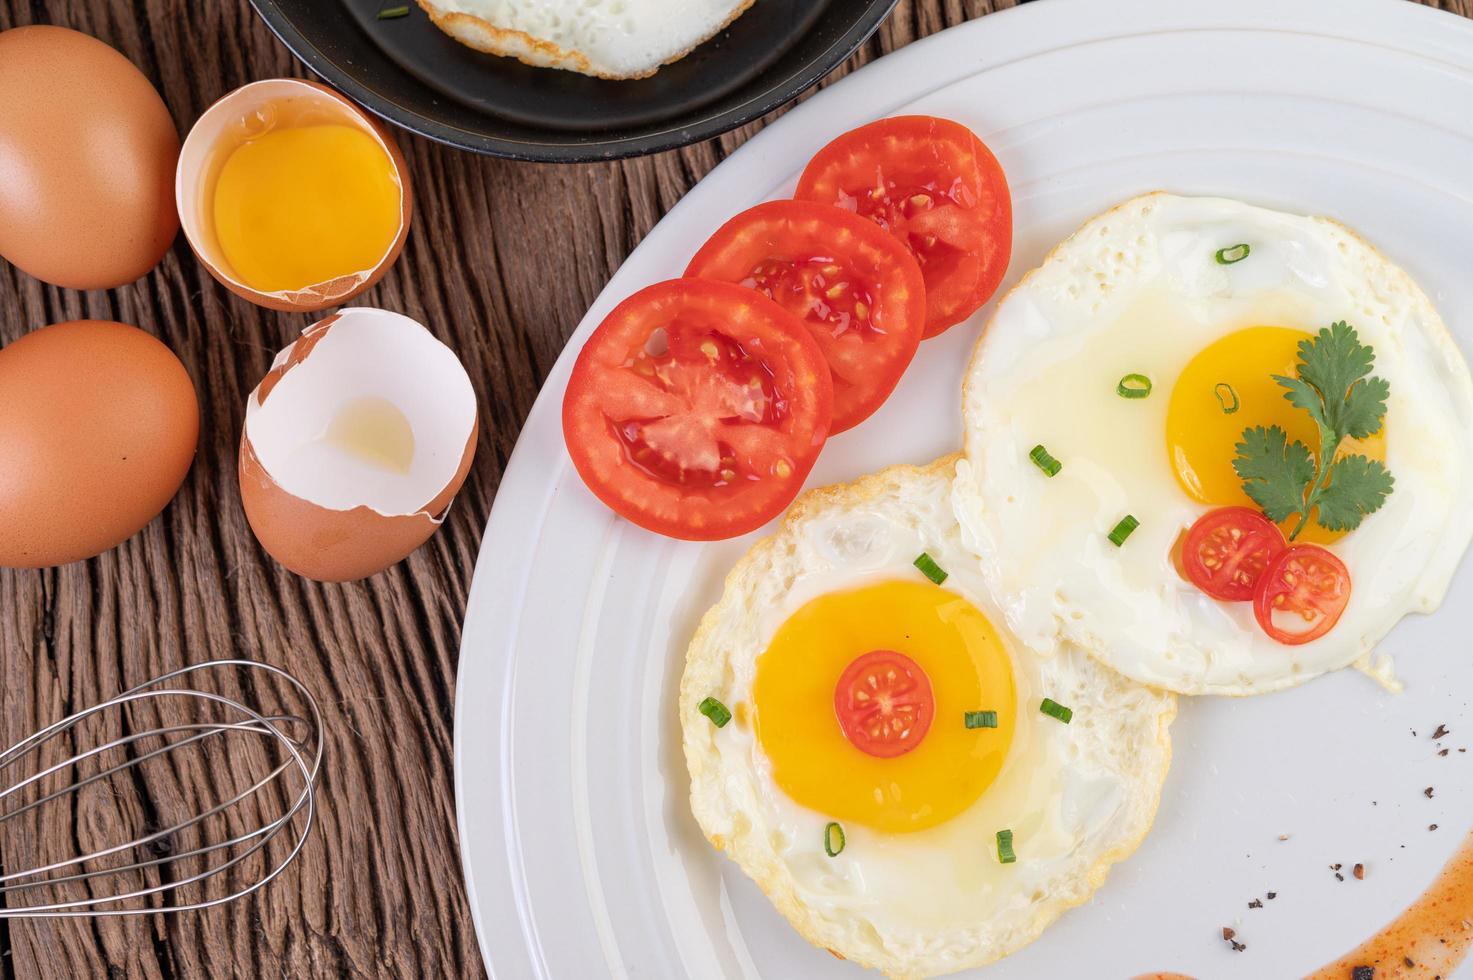 Fried egg breakfast photo